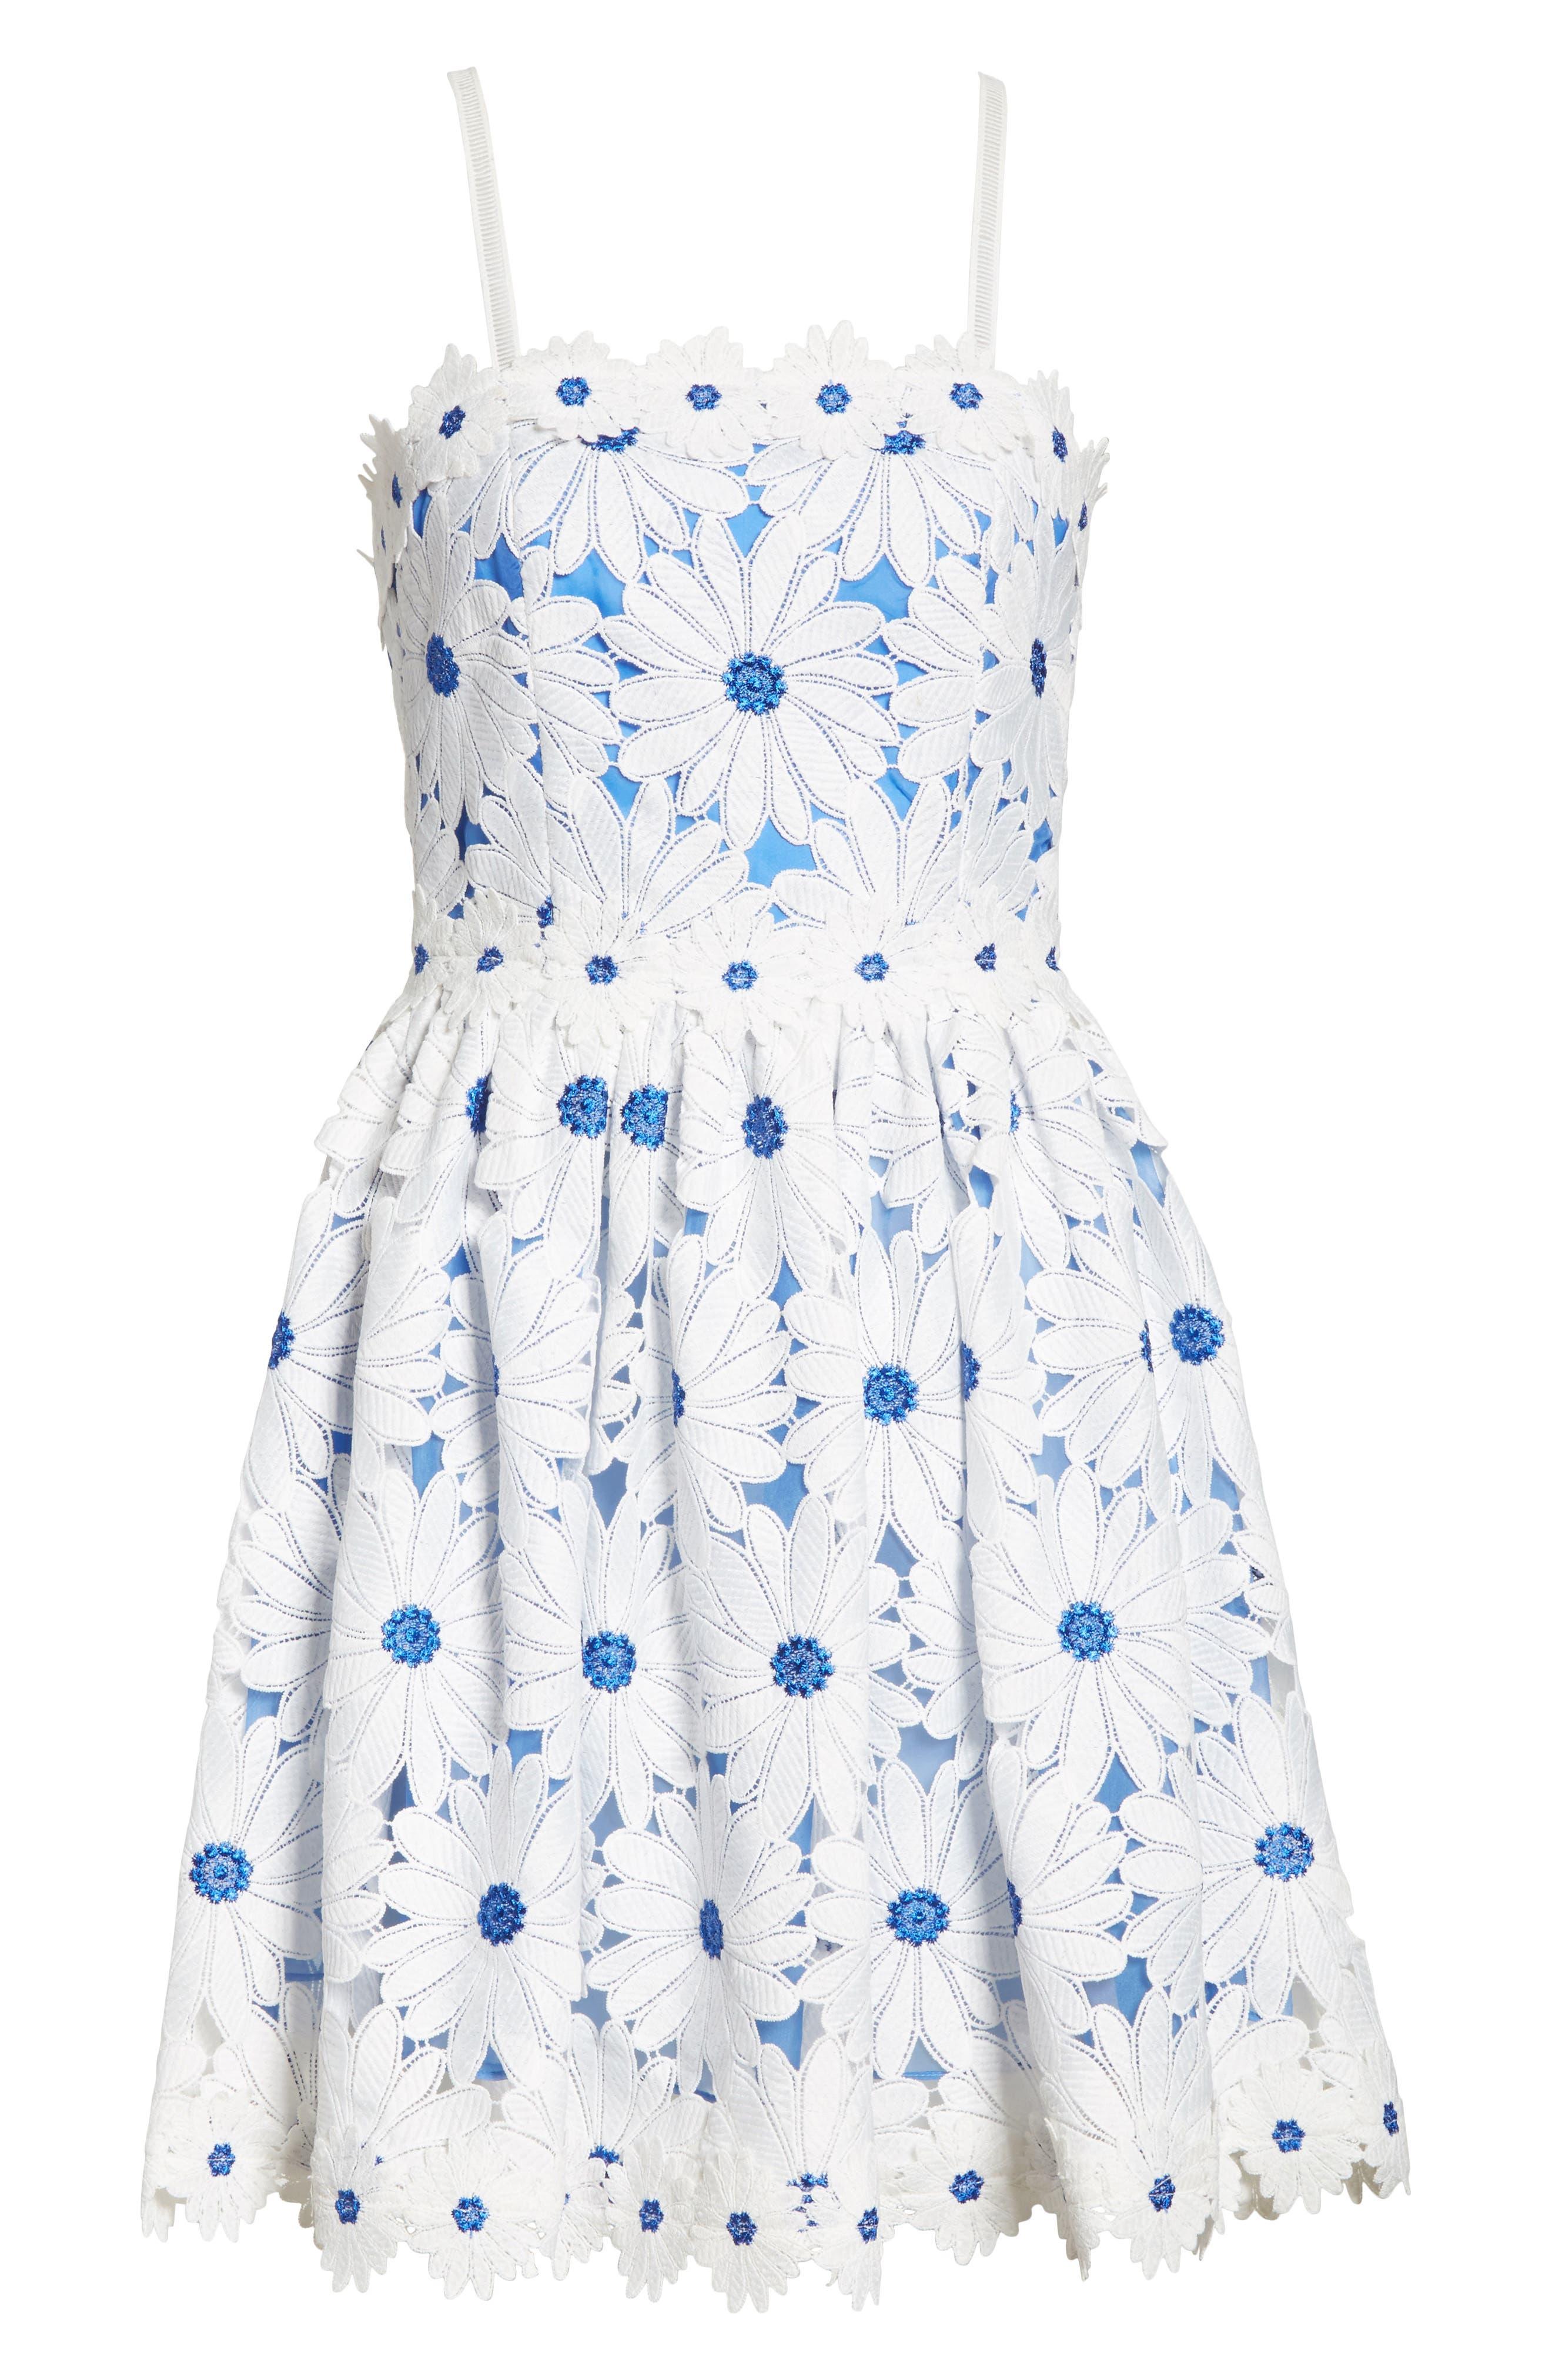 Vandy Lace Minidress,                             Alternate thumbnail 6, color,                             White/ Blue